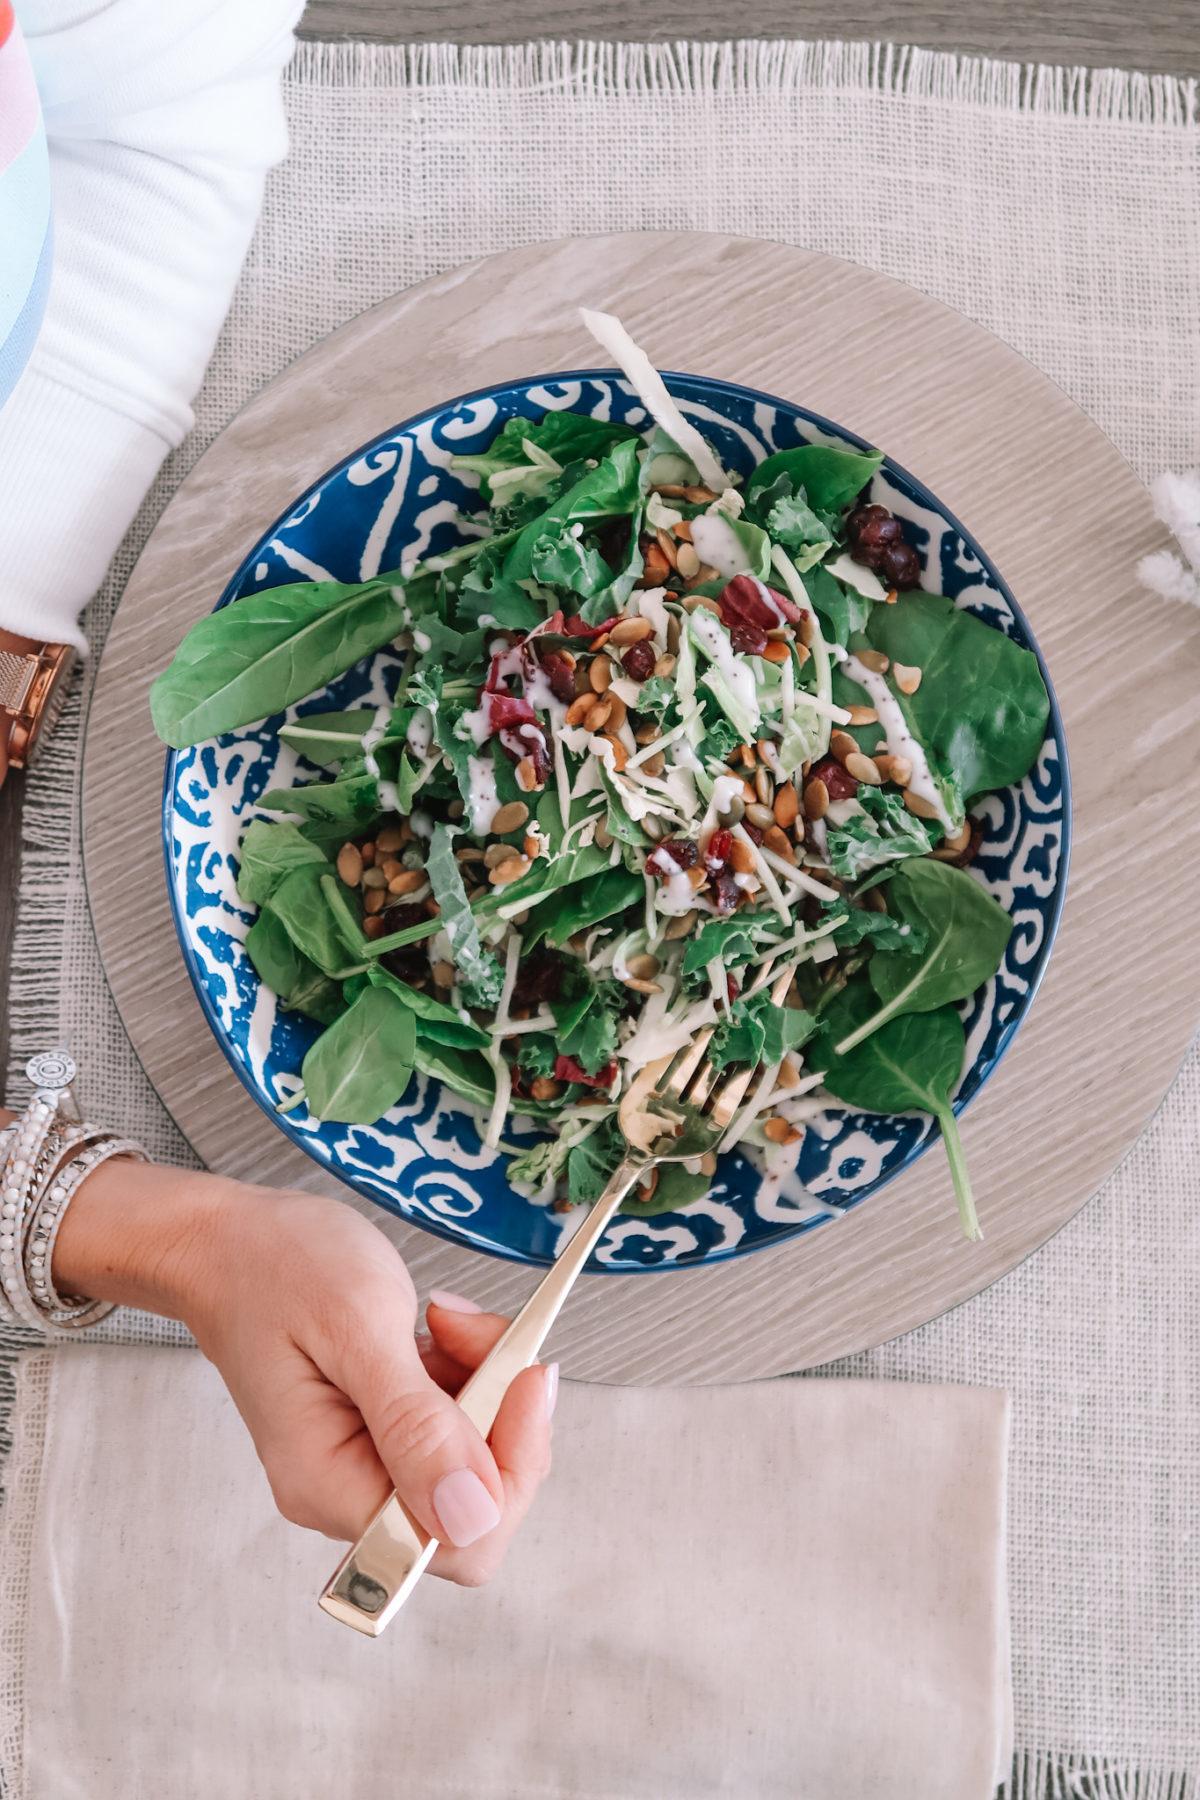 What I'm eating, Salad